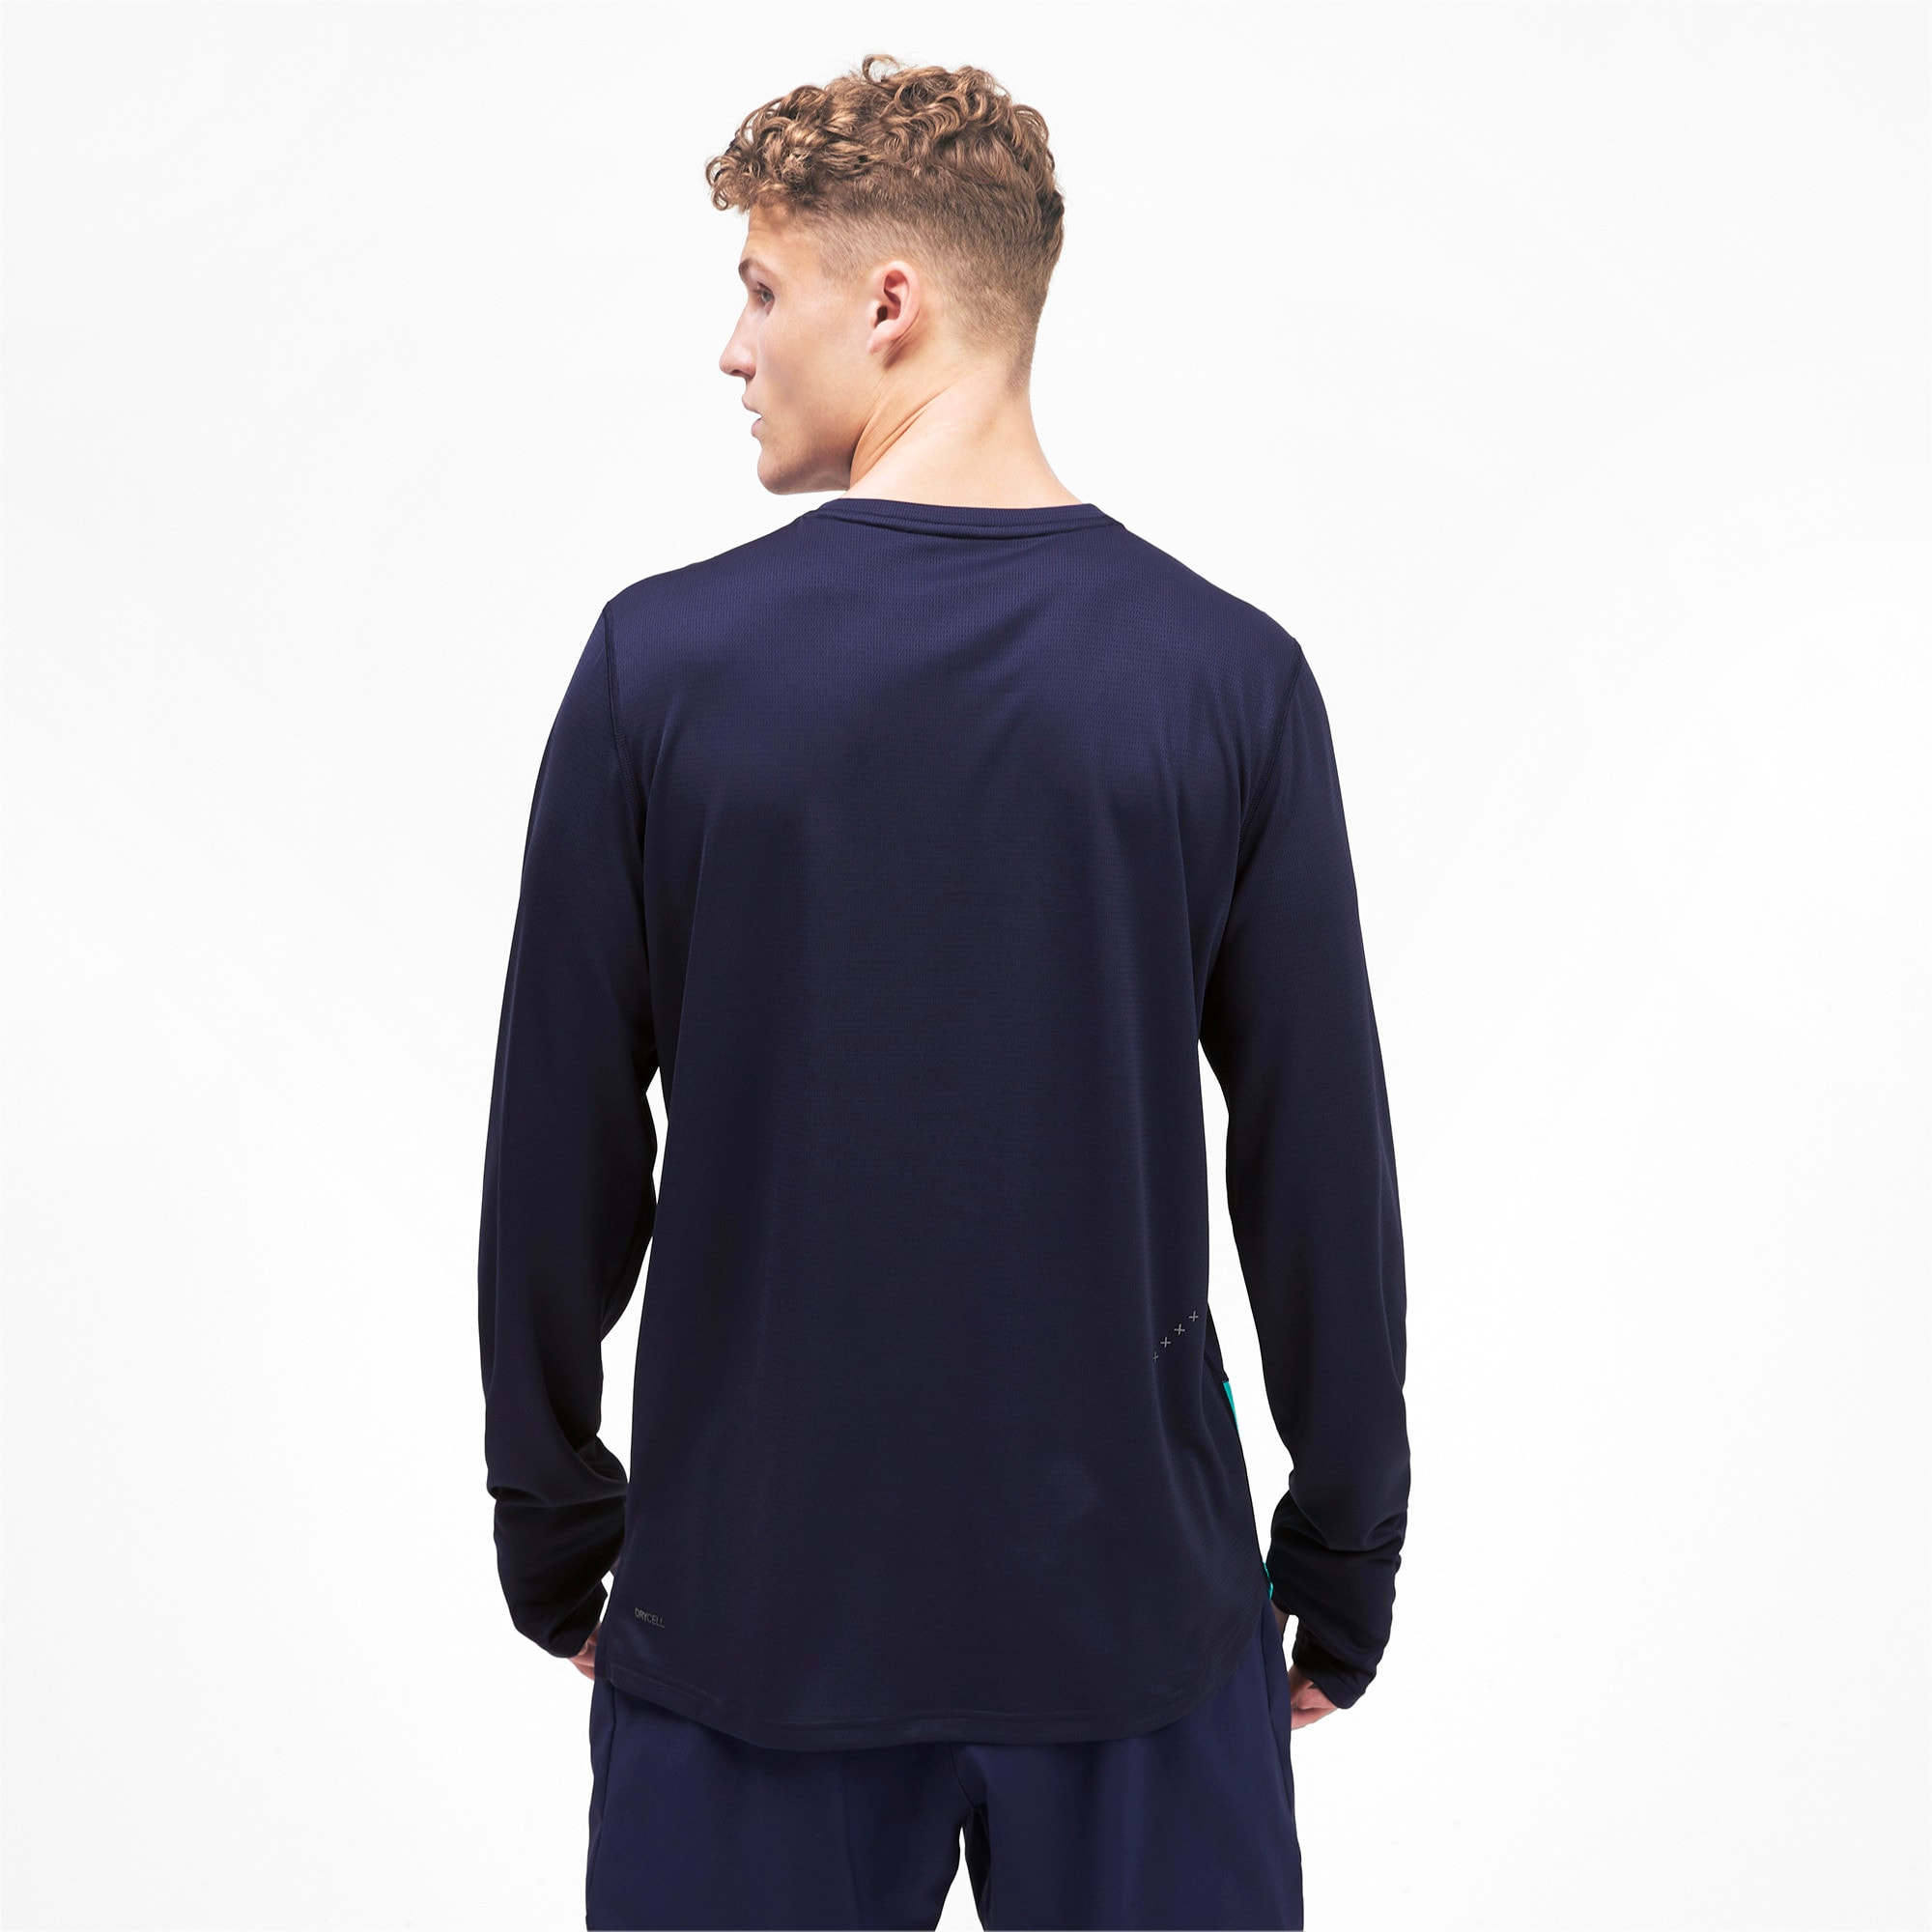 Thumbnail 2 of Ignite Men's Long Sleeve Tee, Peacoat-Blue Turquoise, medium